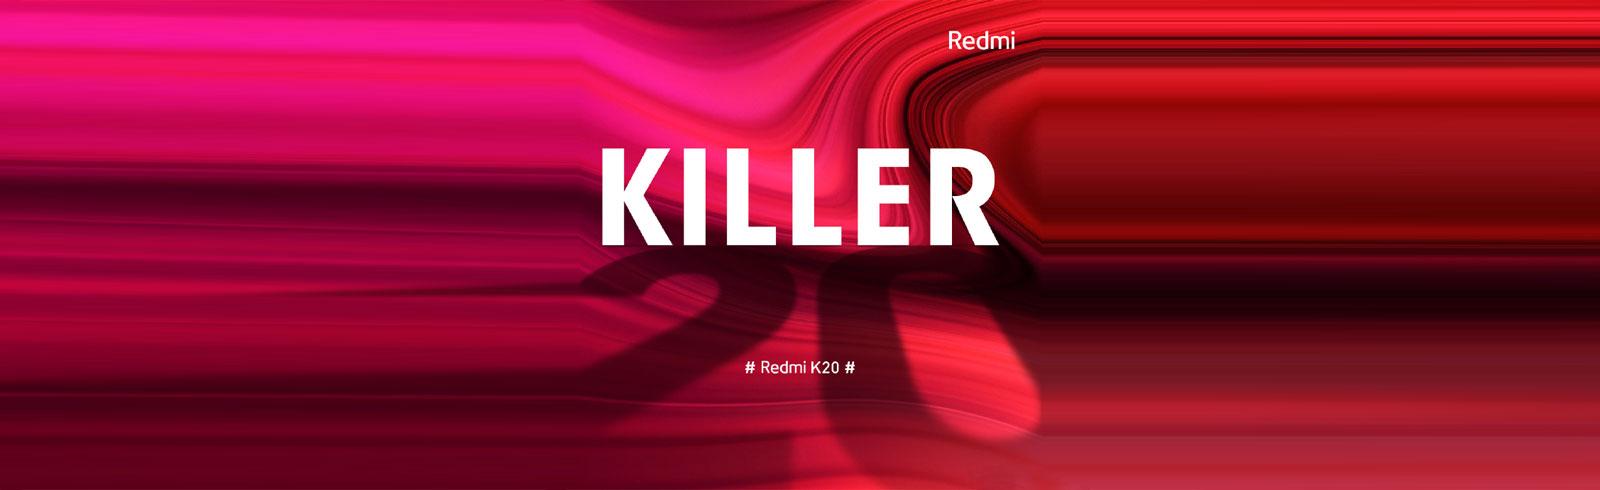 The Redmi K20 moniker is official for Xiaomi's Redmi flagship killer